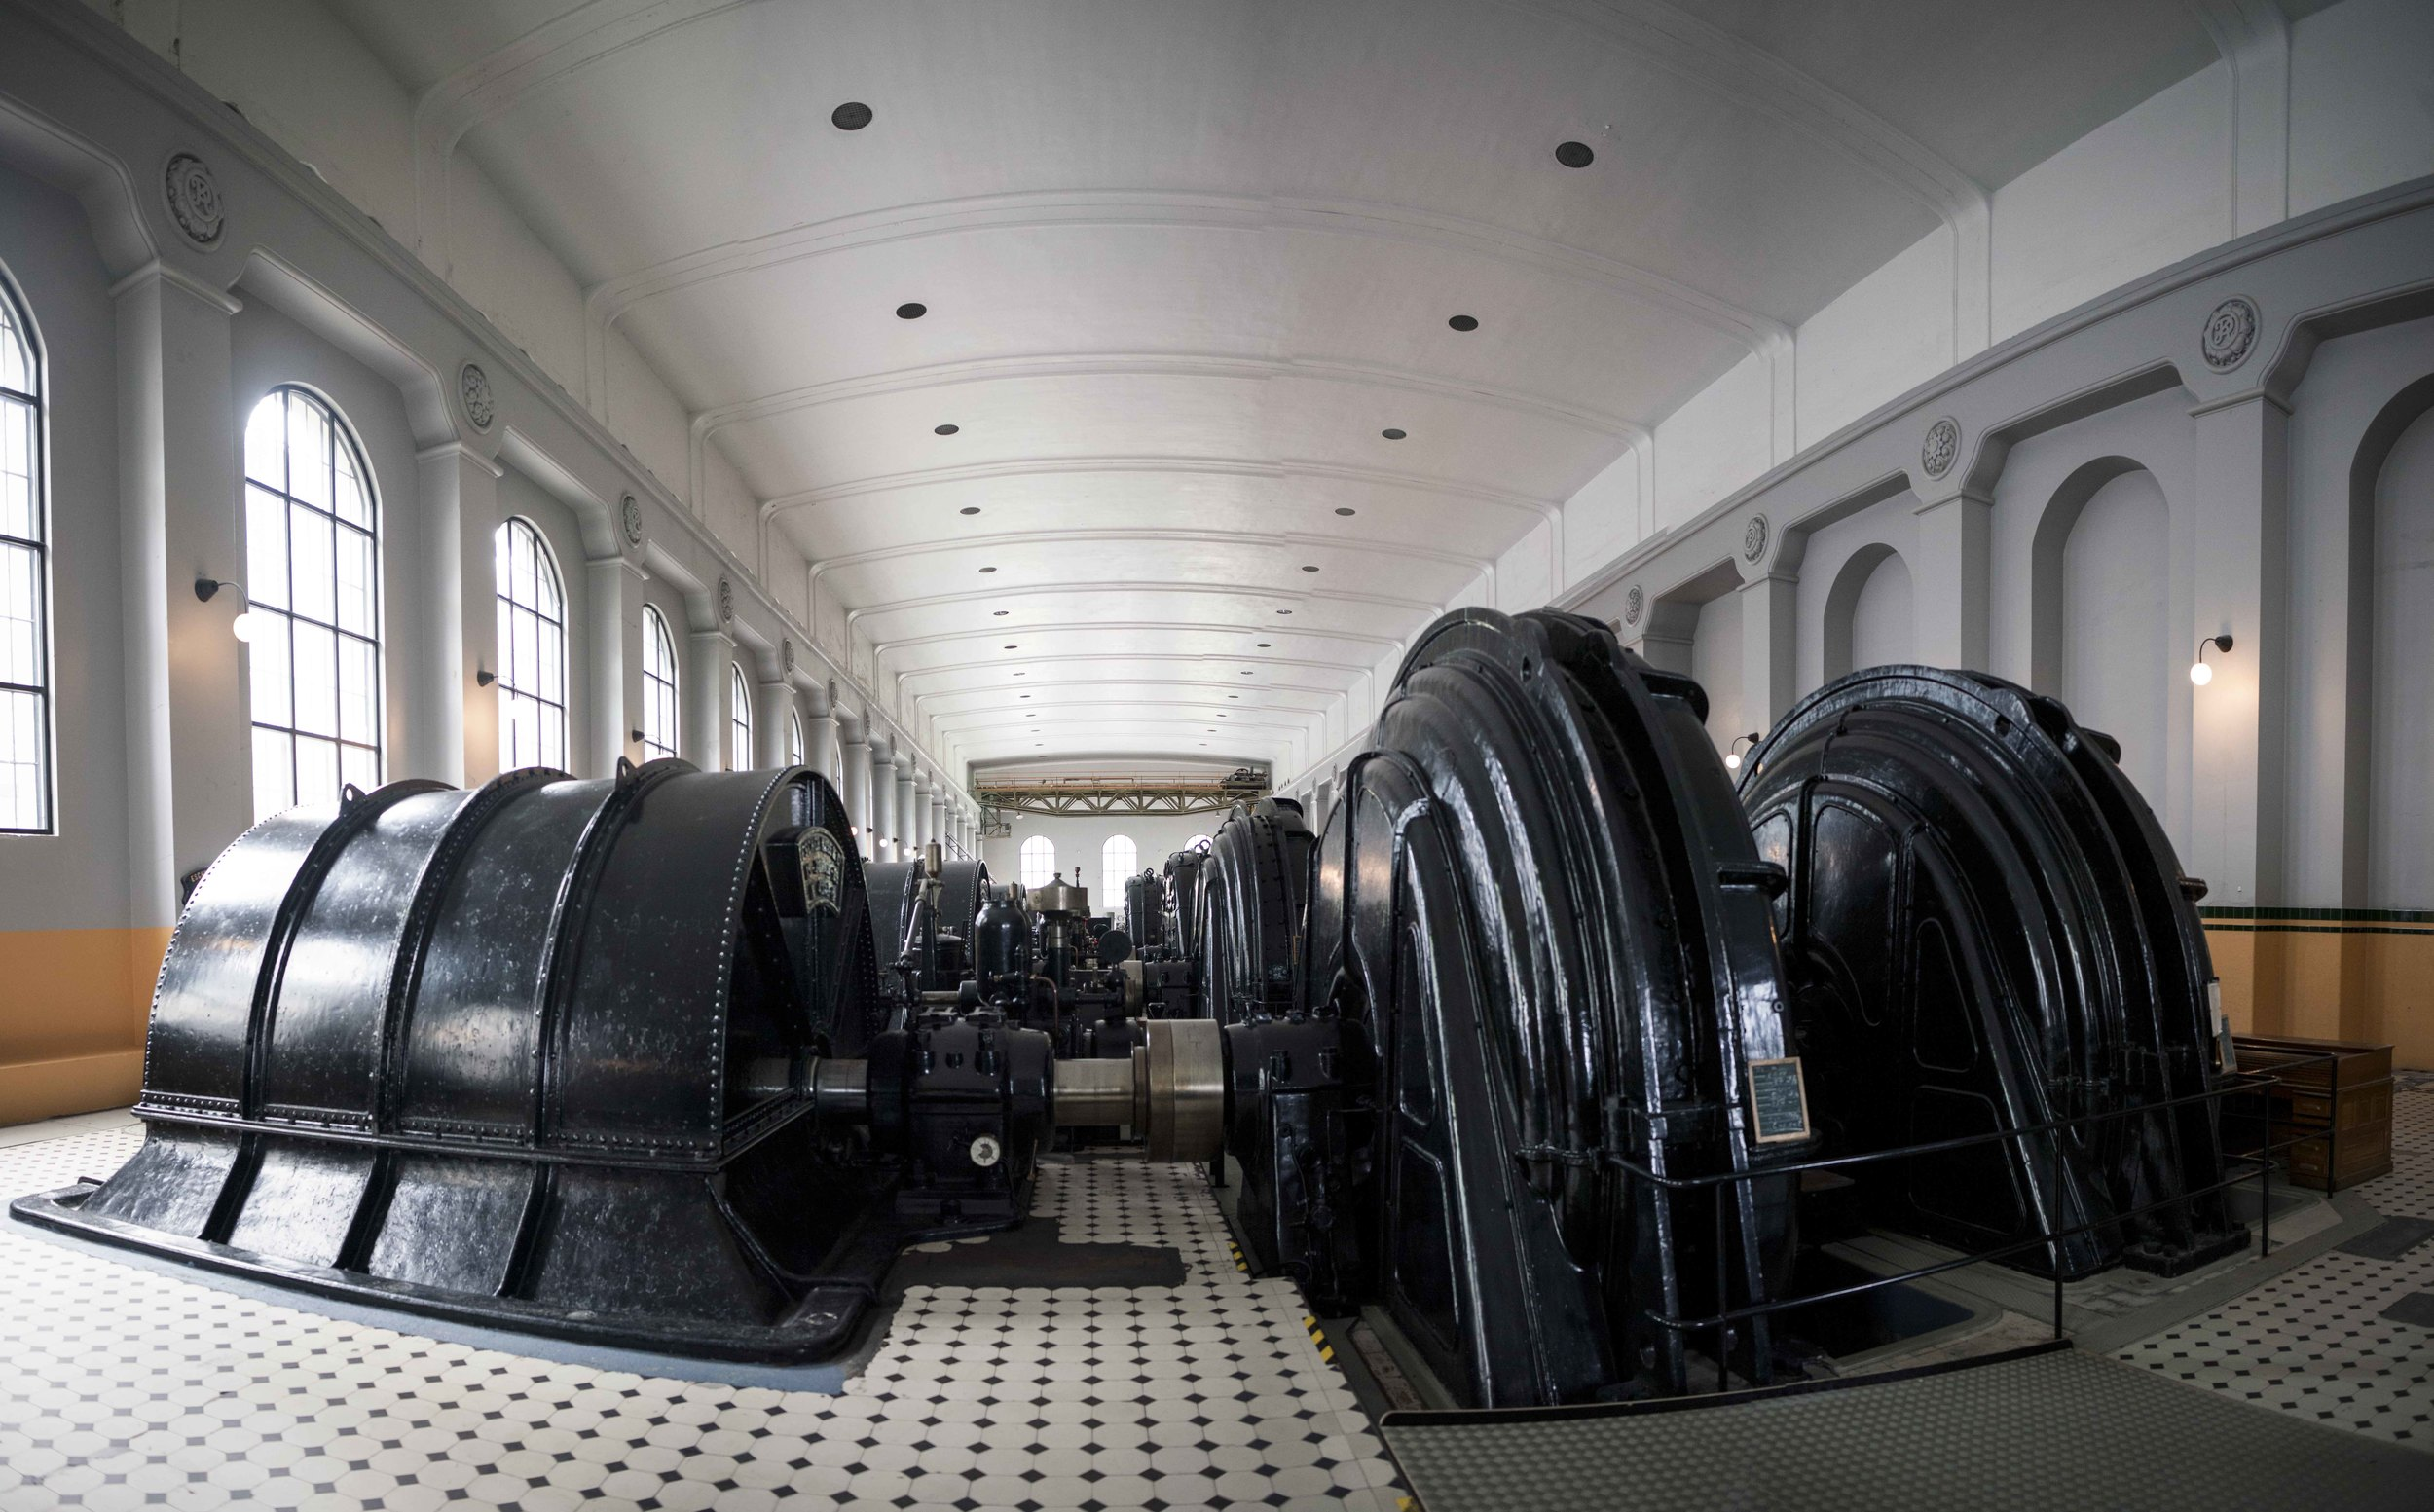 Inside Vemork hydroelectric plant